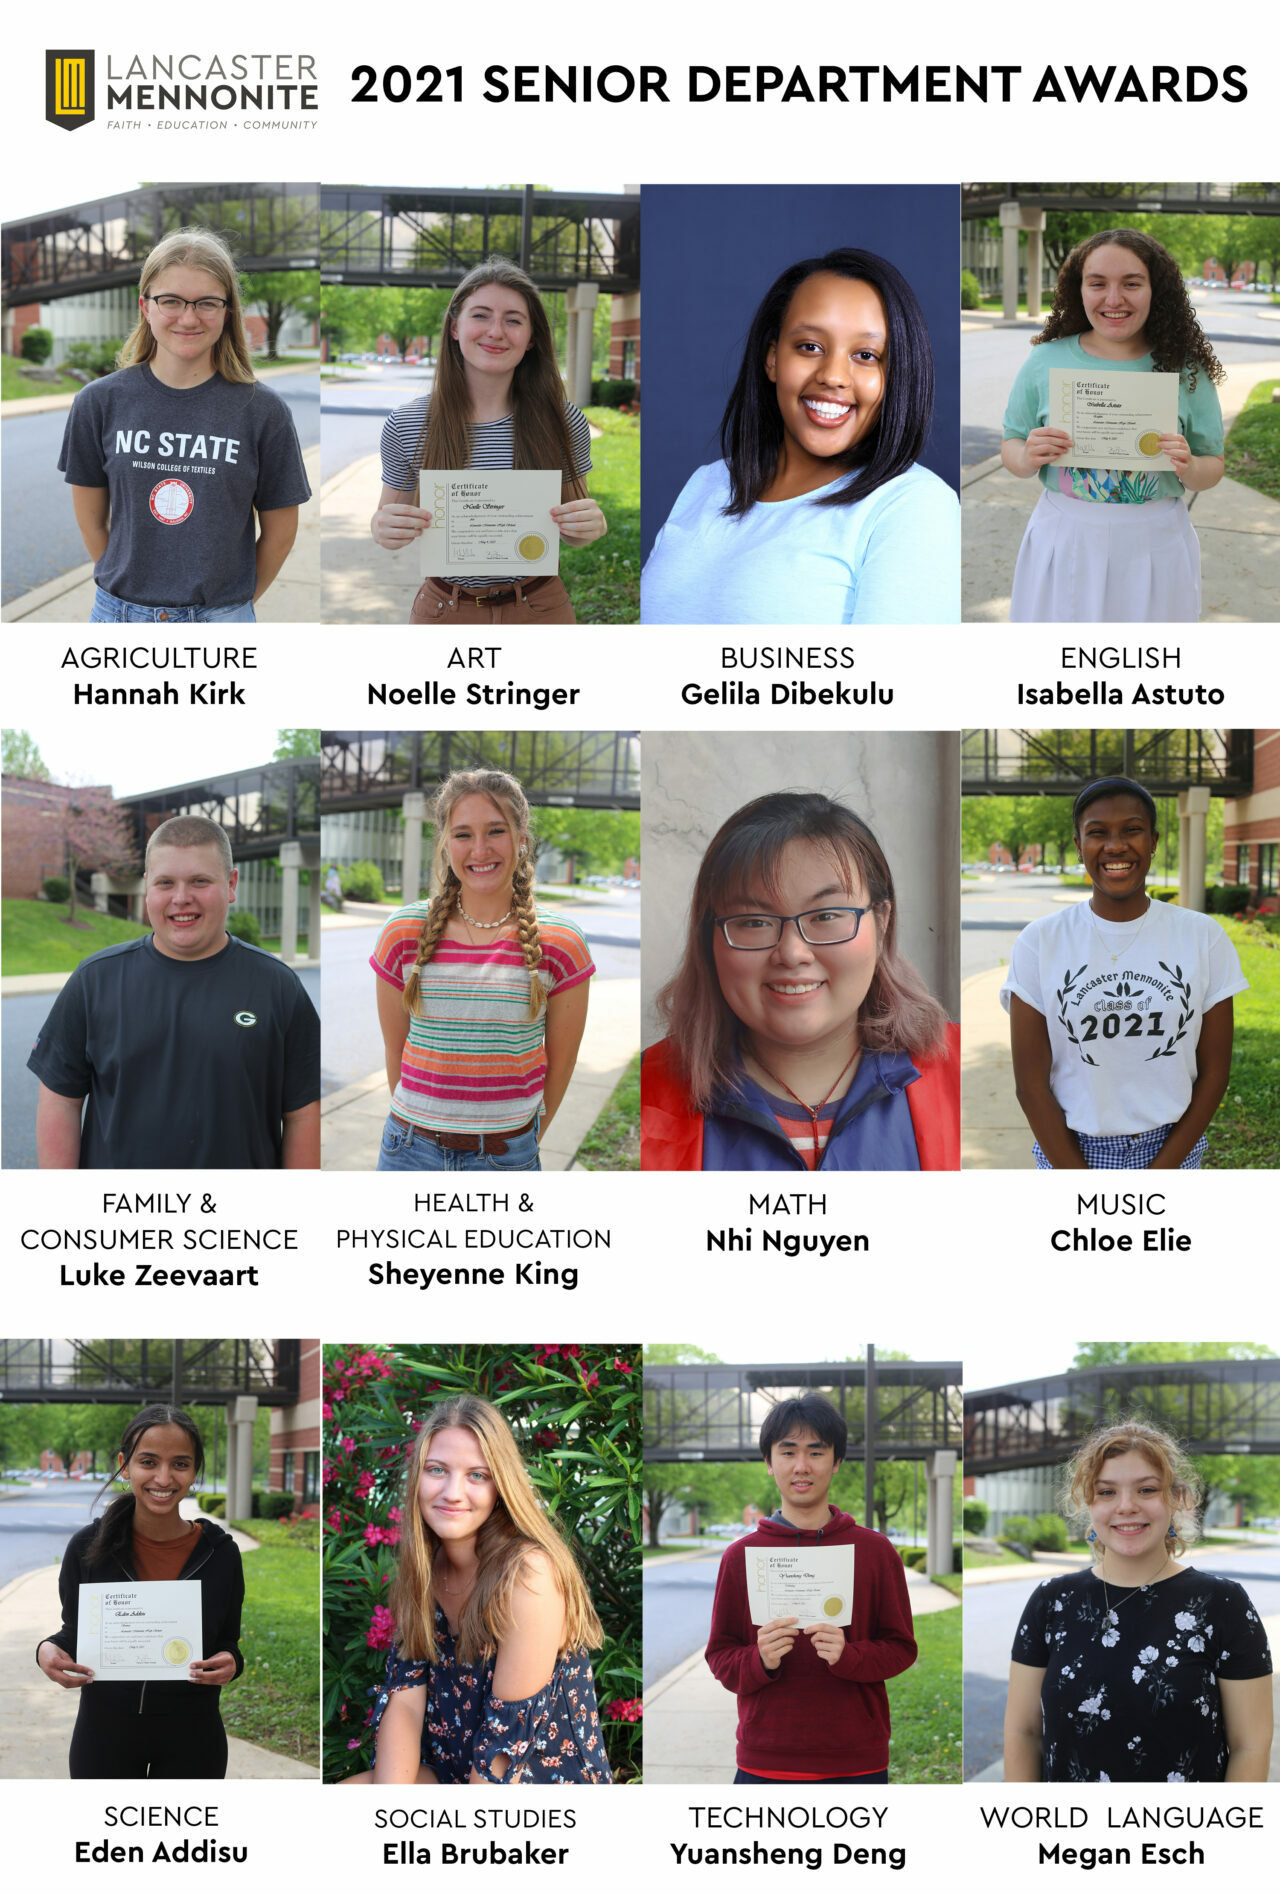 senior award winners photo collage of 12 students